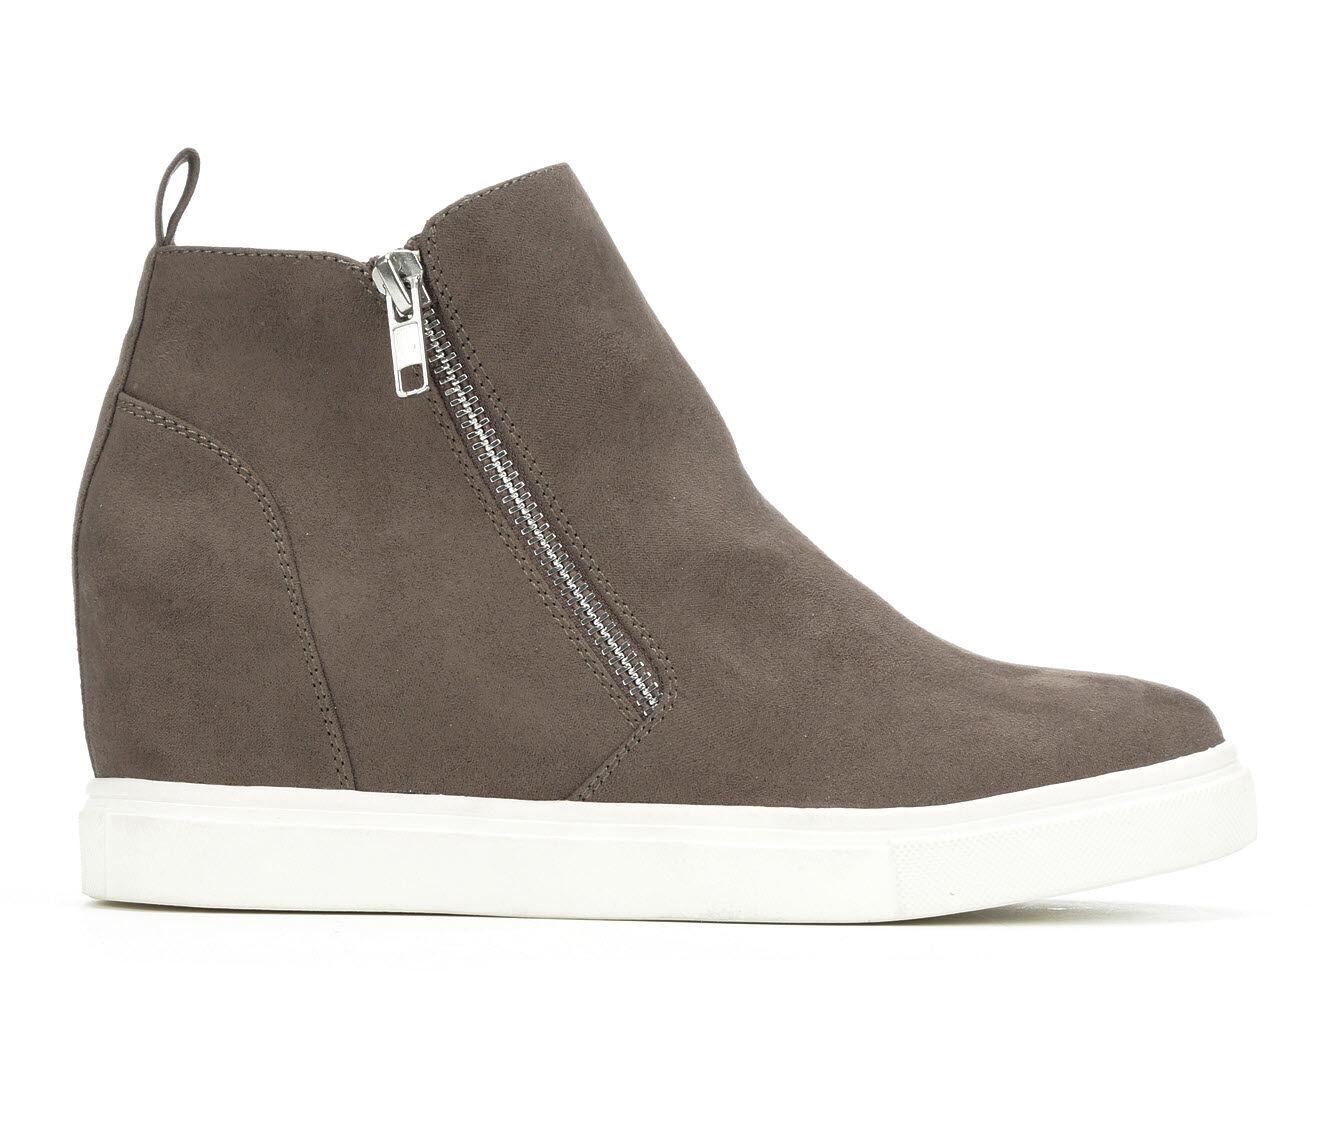 Piperr Wedge Sneakers | Shoe Carnival